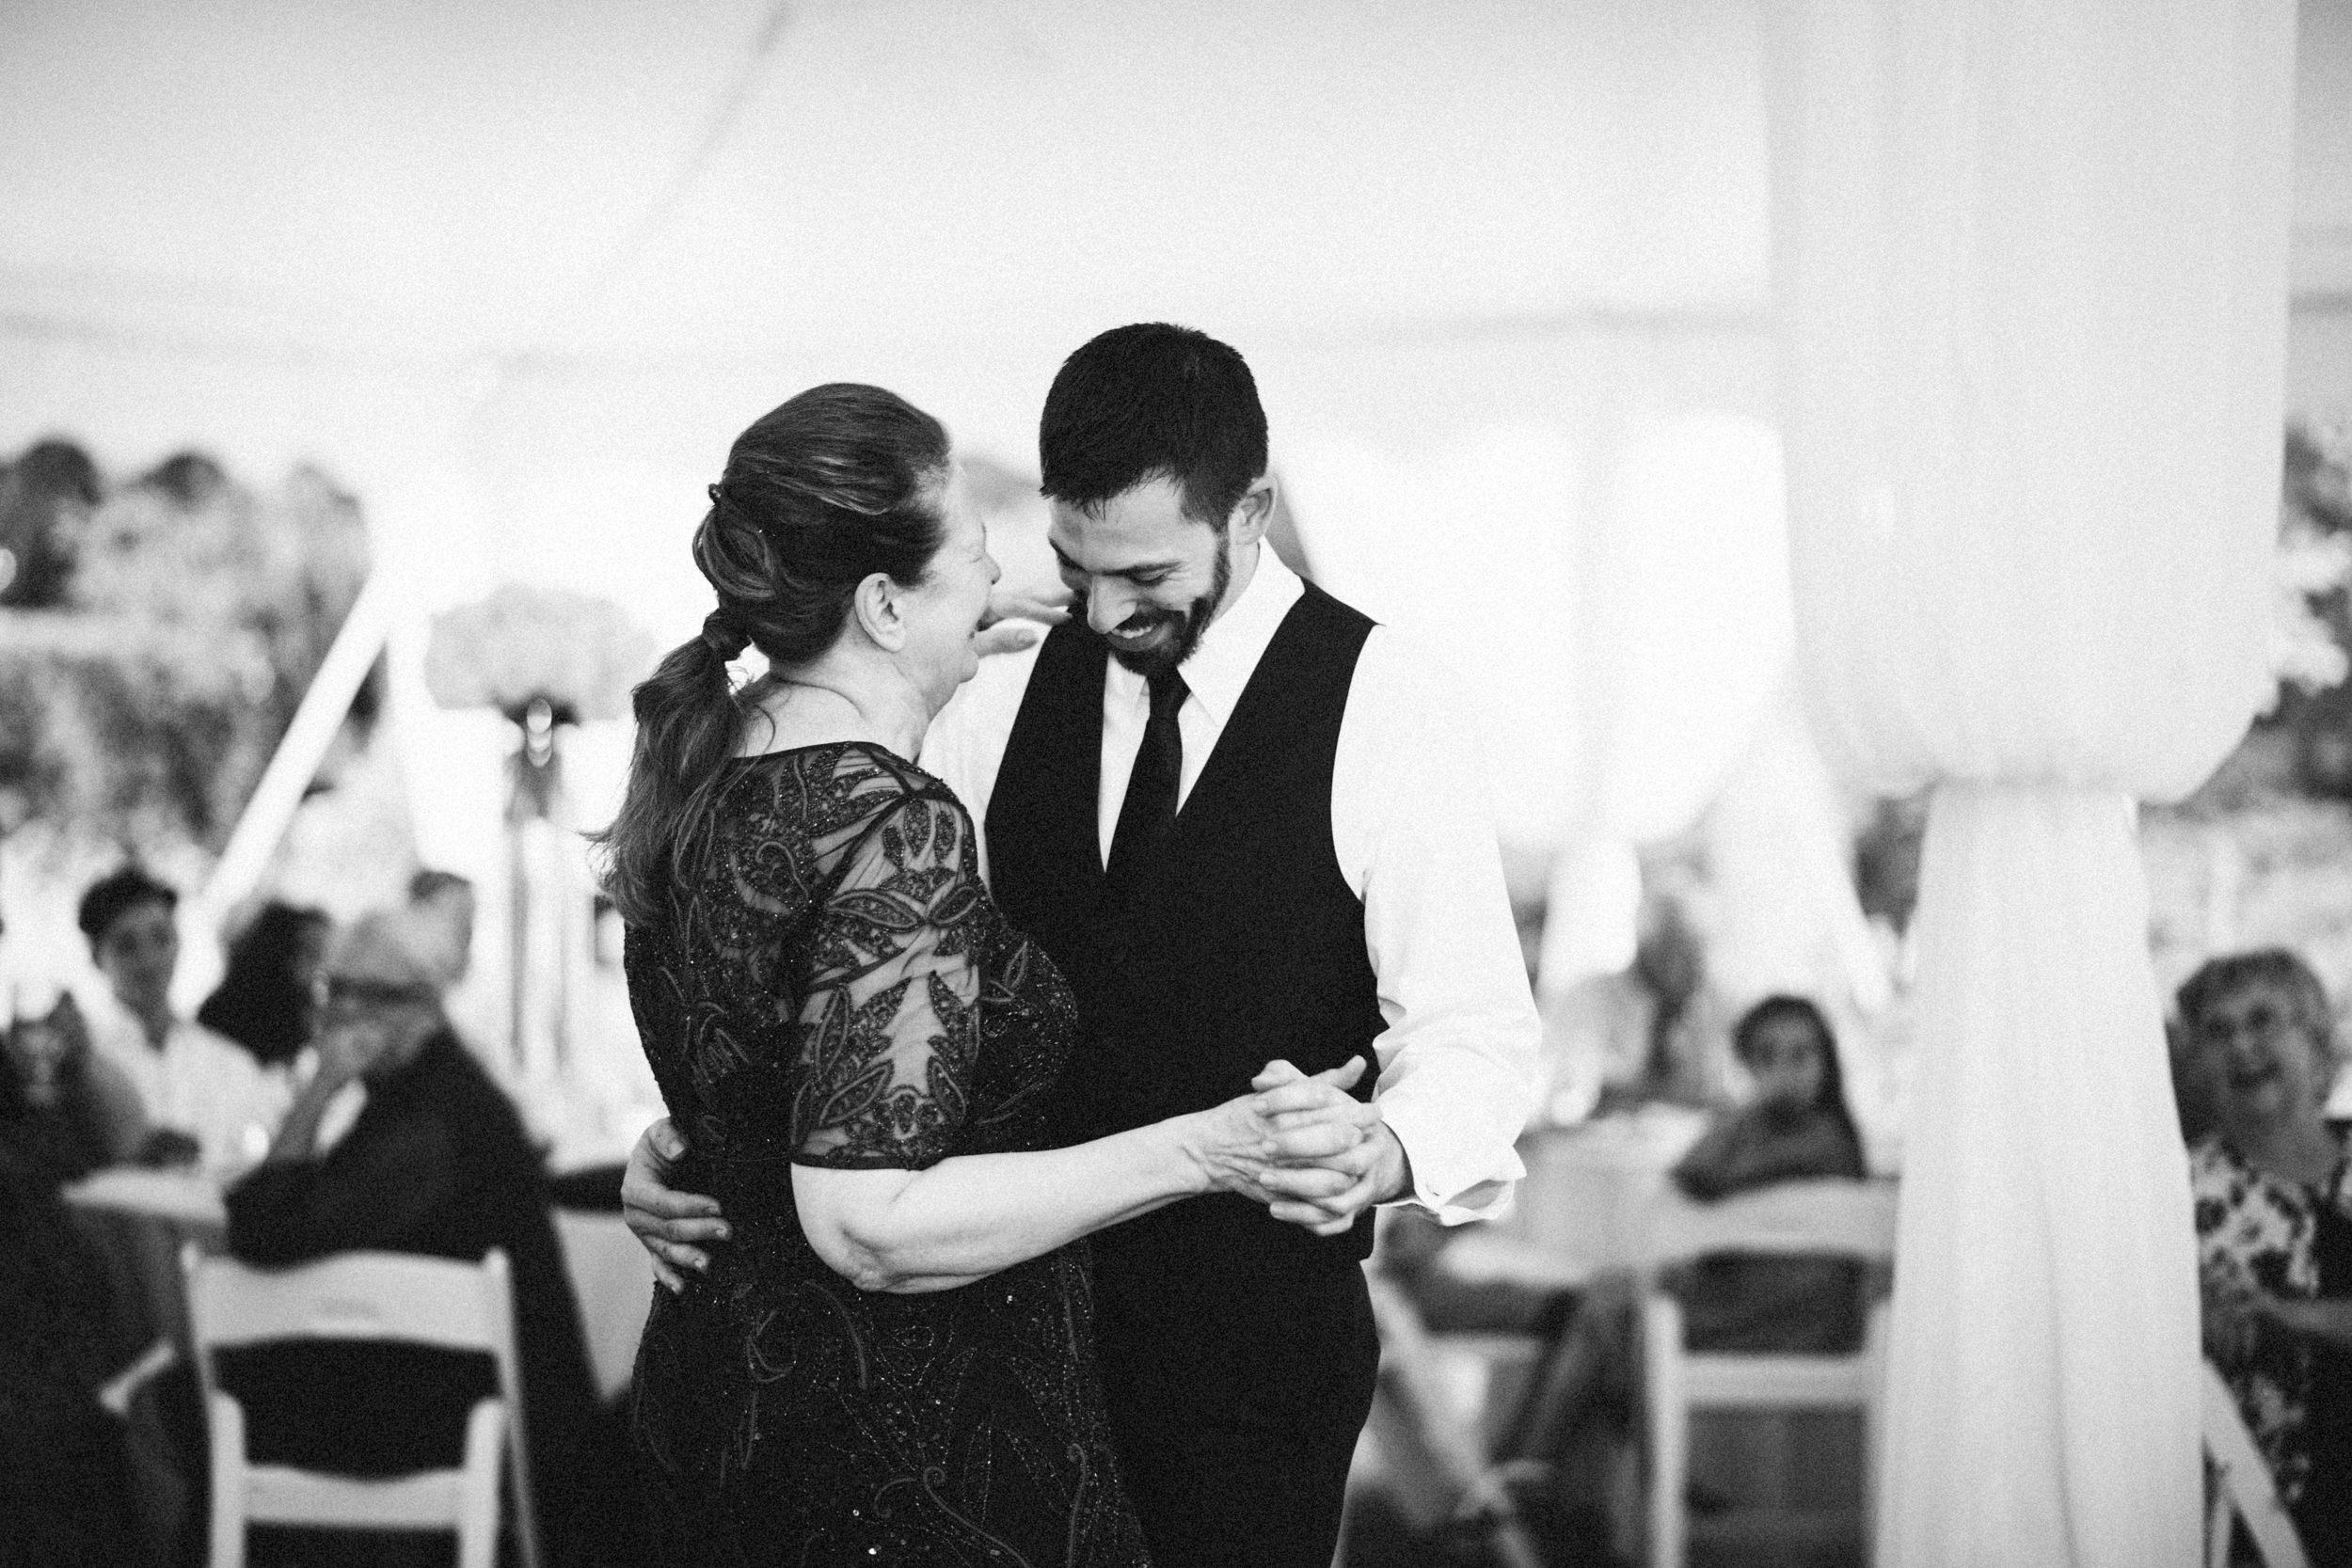 Louisville-Kentucky-Wedding-Elopement-Photographer-Sarah-Katherine-Davis-Photography-Whitehall-Classic-Timeless-Garden-Wedding-693.jpg